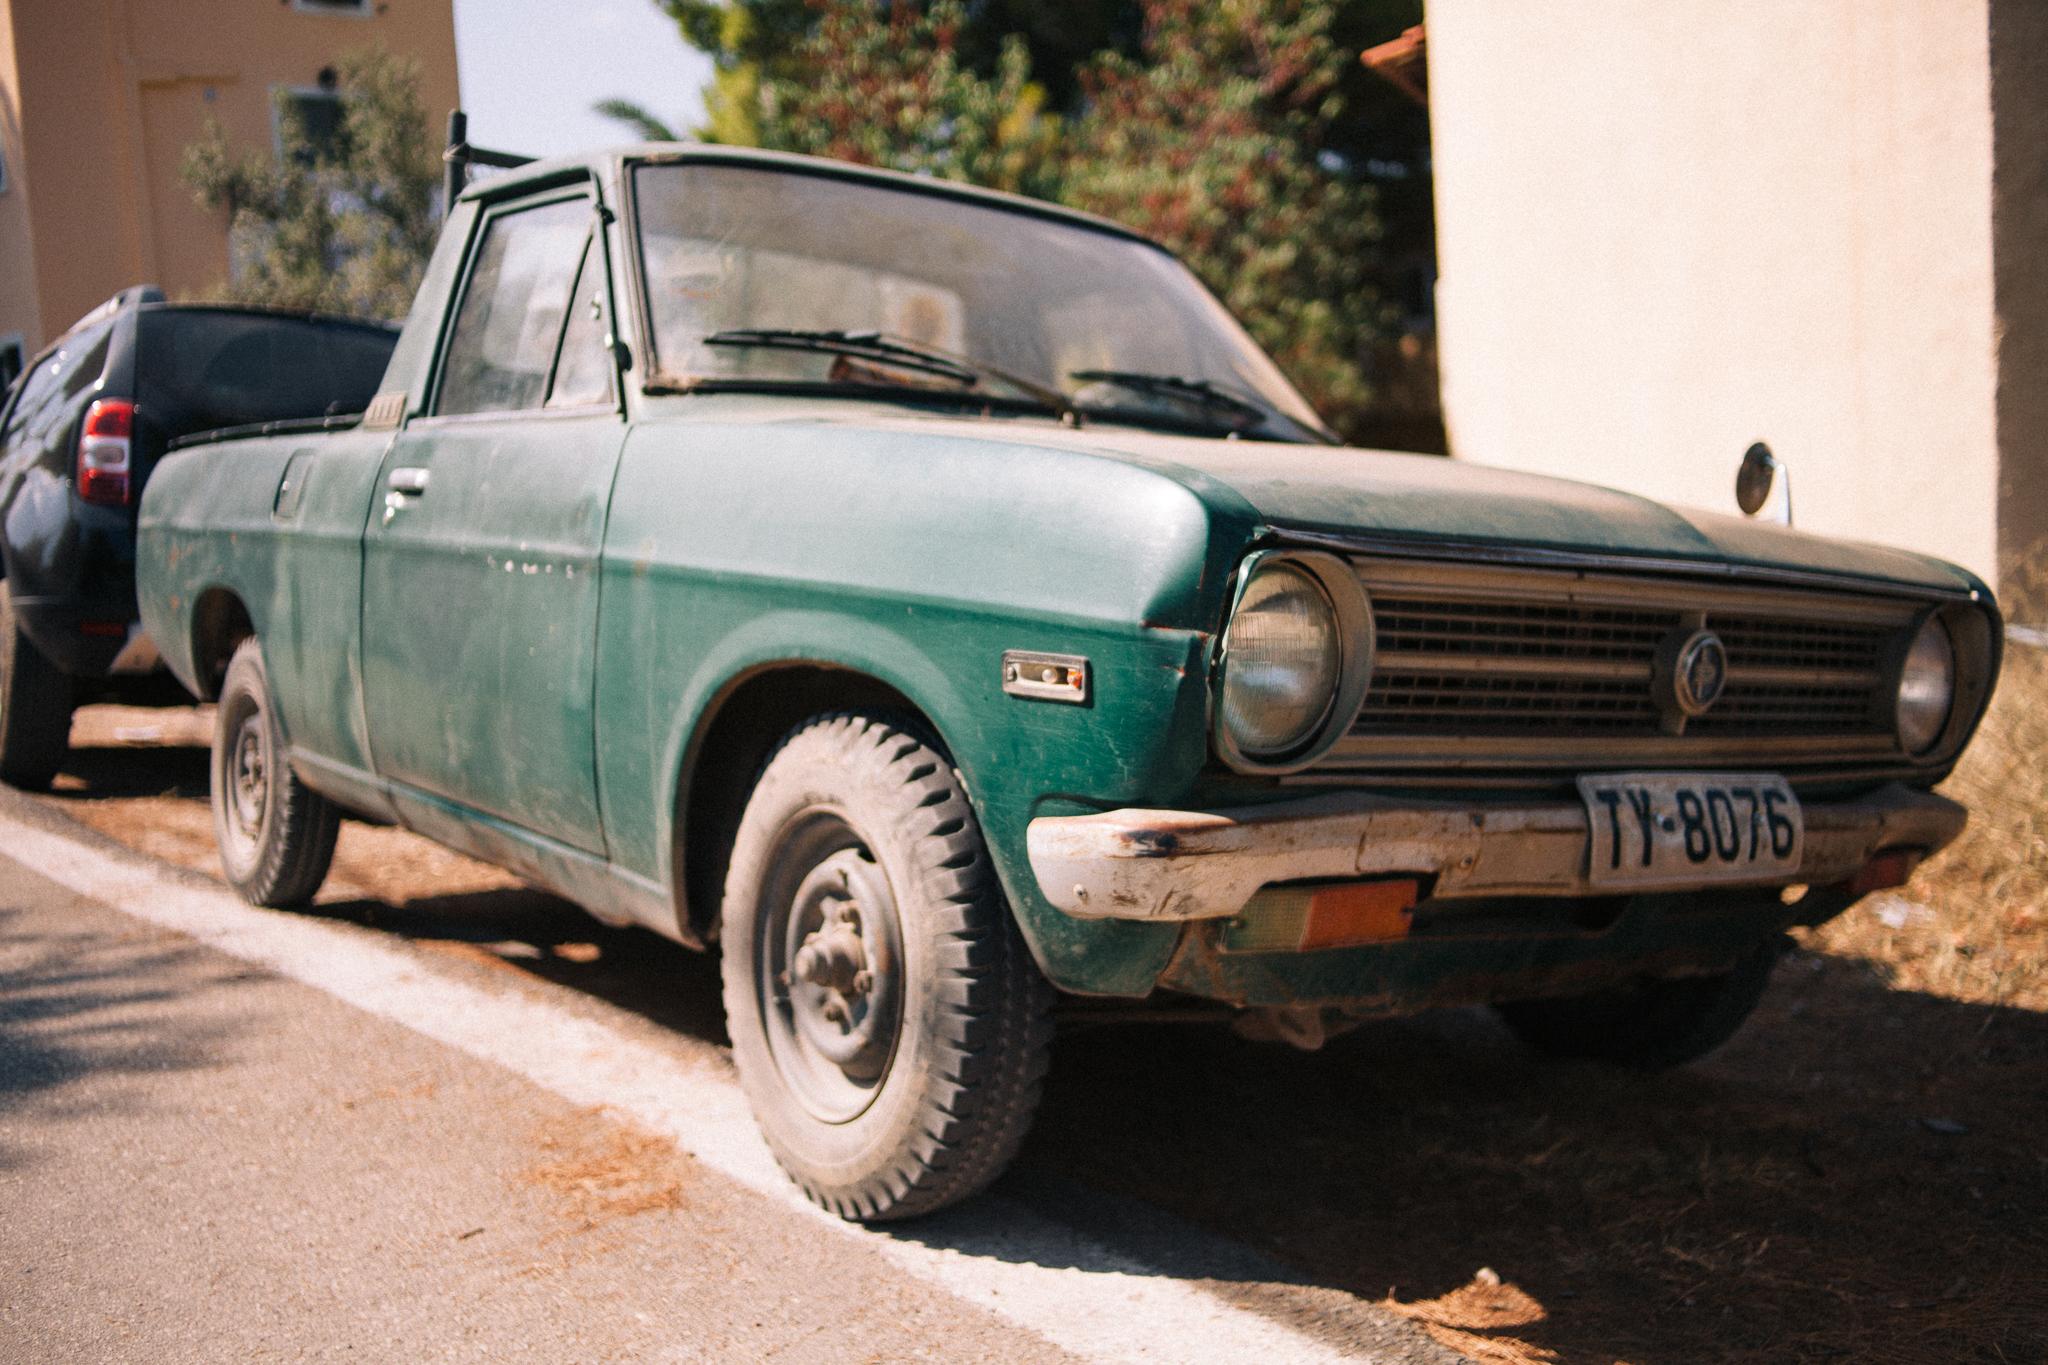 A good old Datsun pickup